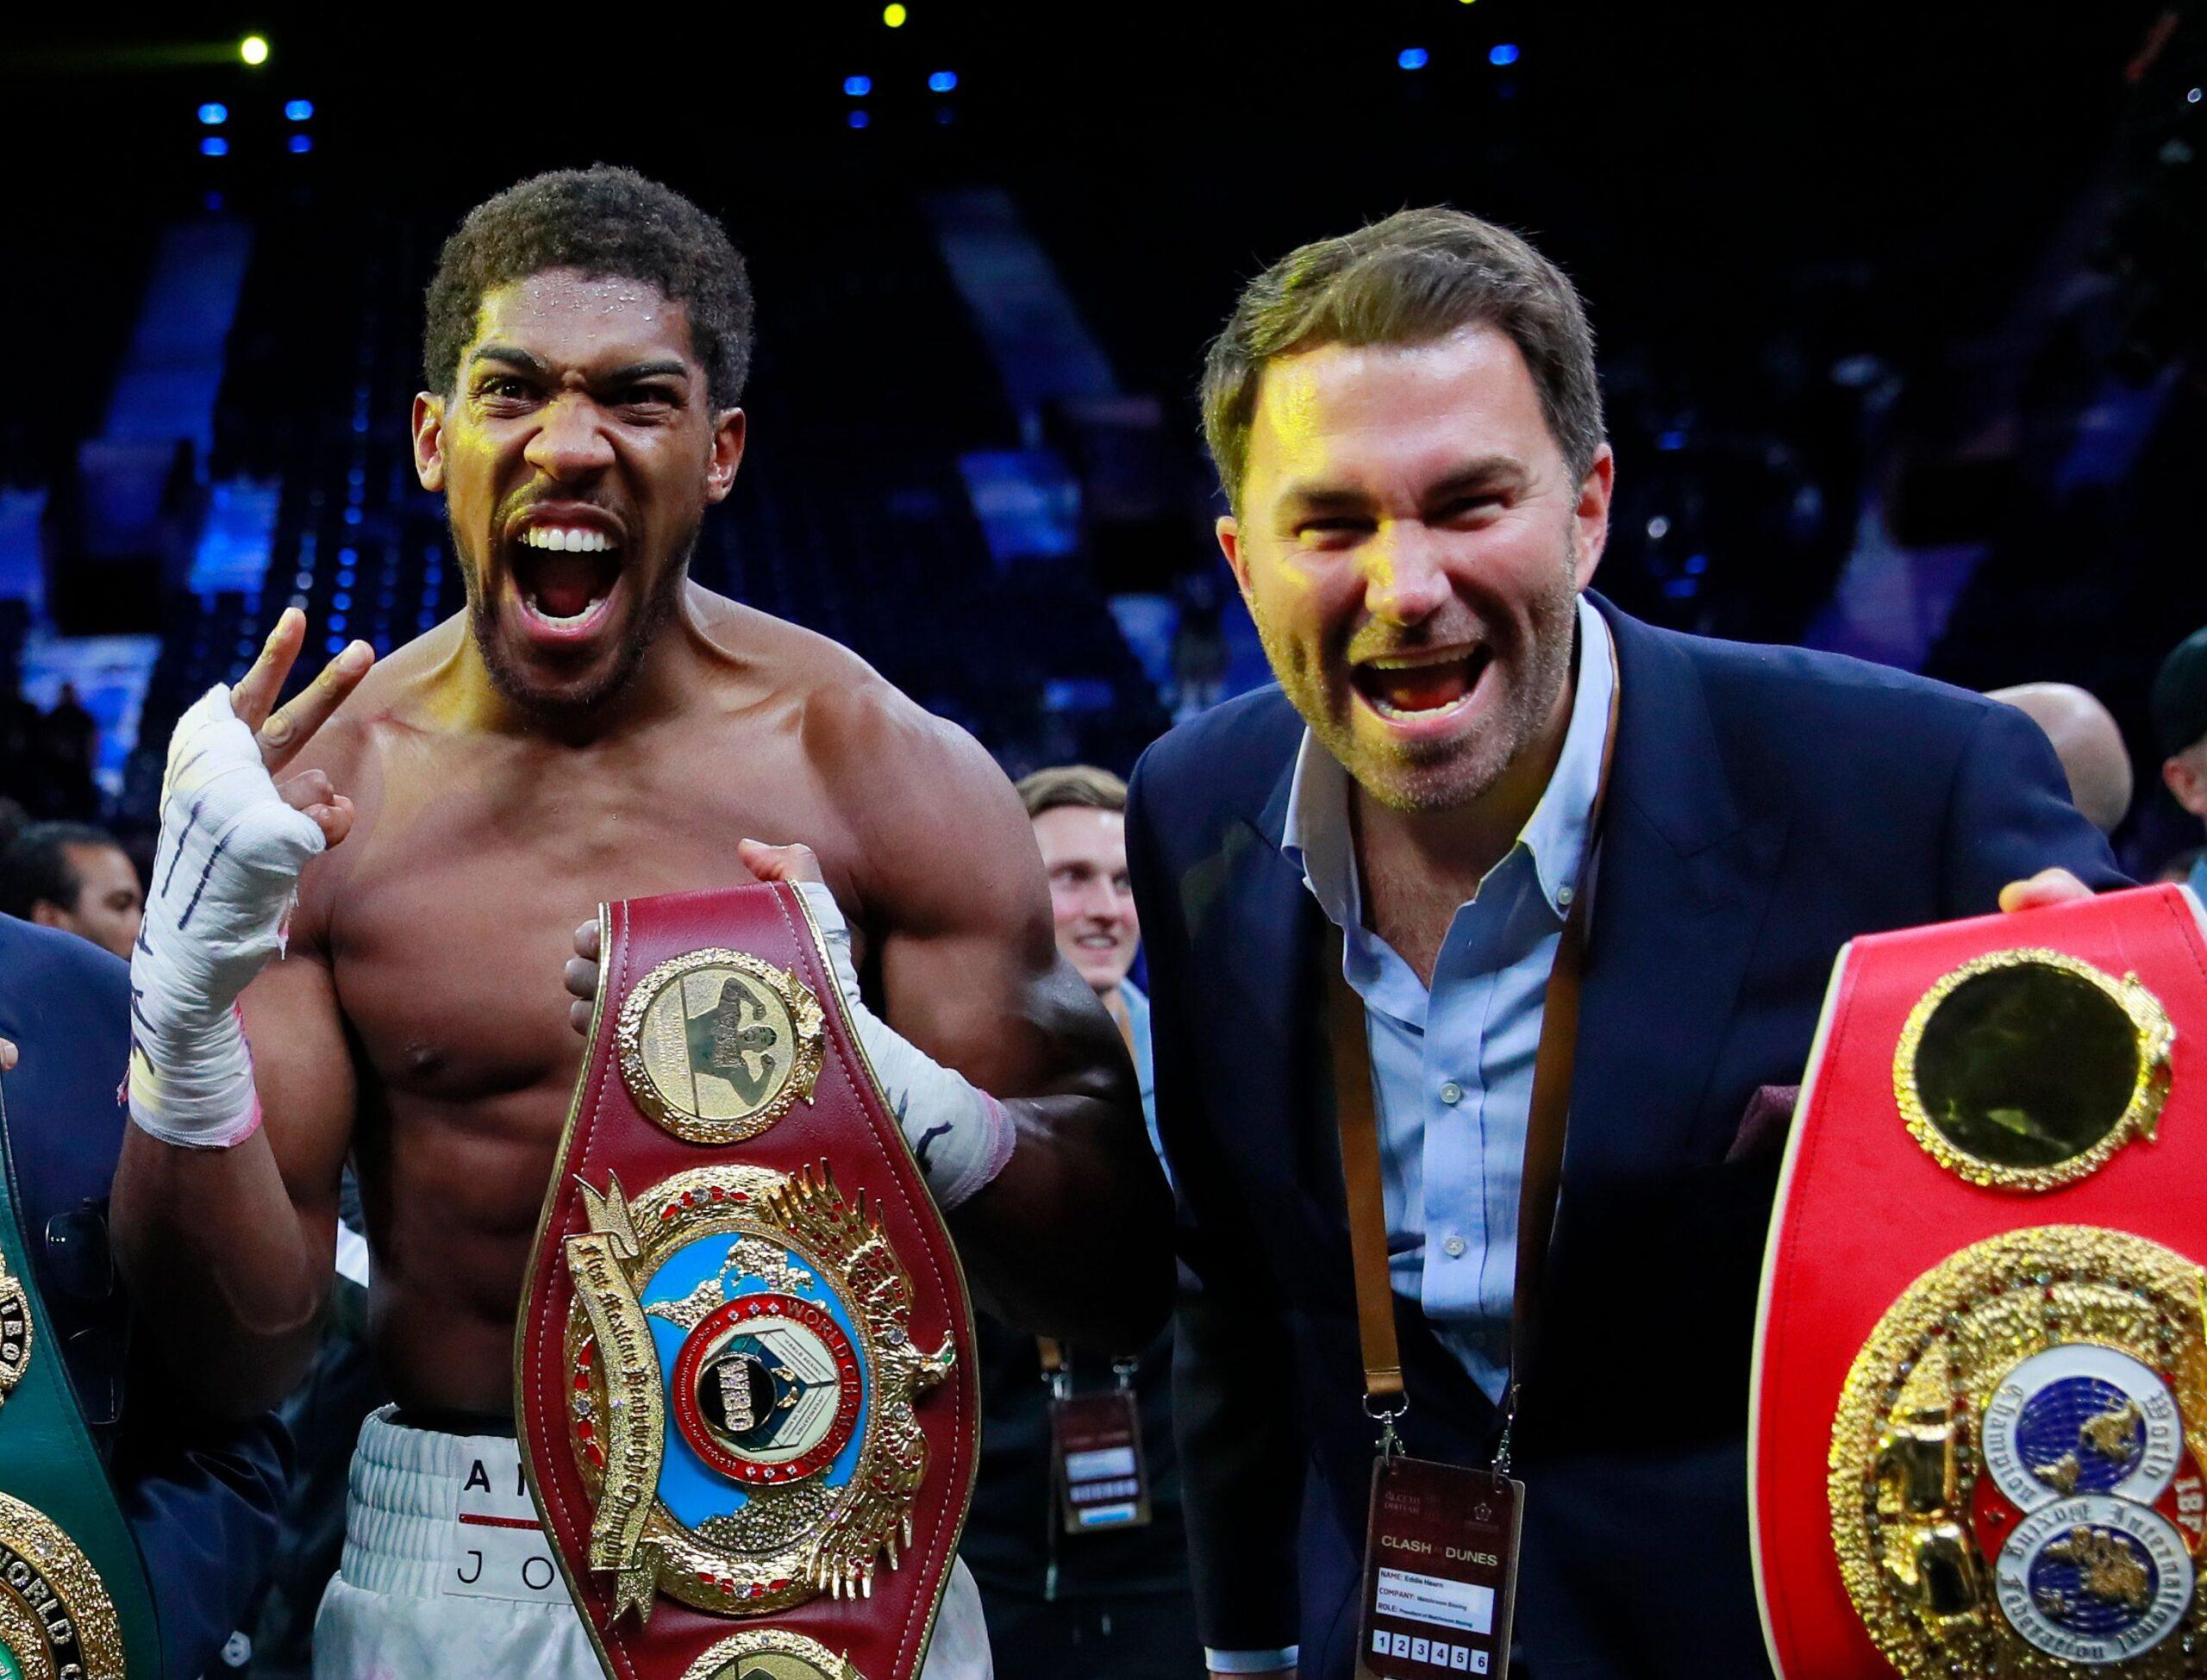 Anthony Joshua & Eddie Hearn (Matchroom Boxing)